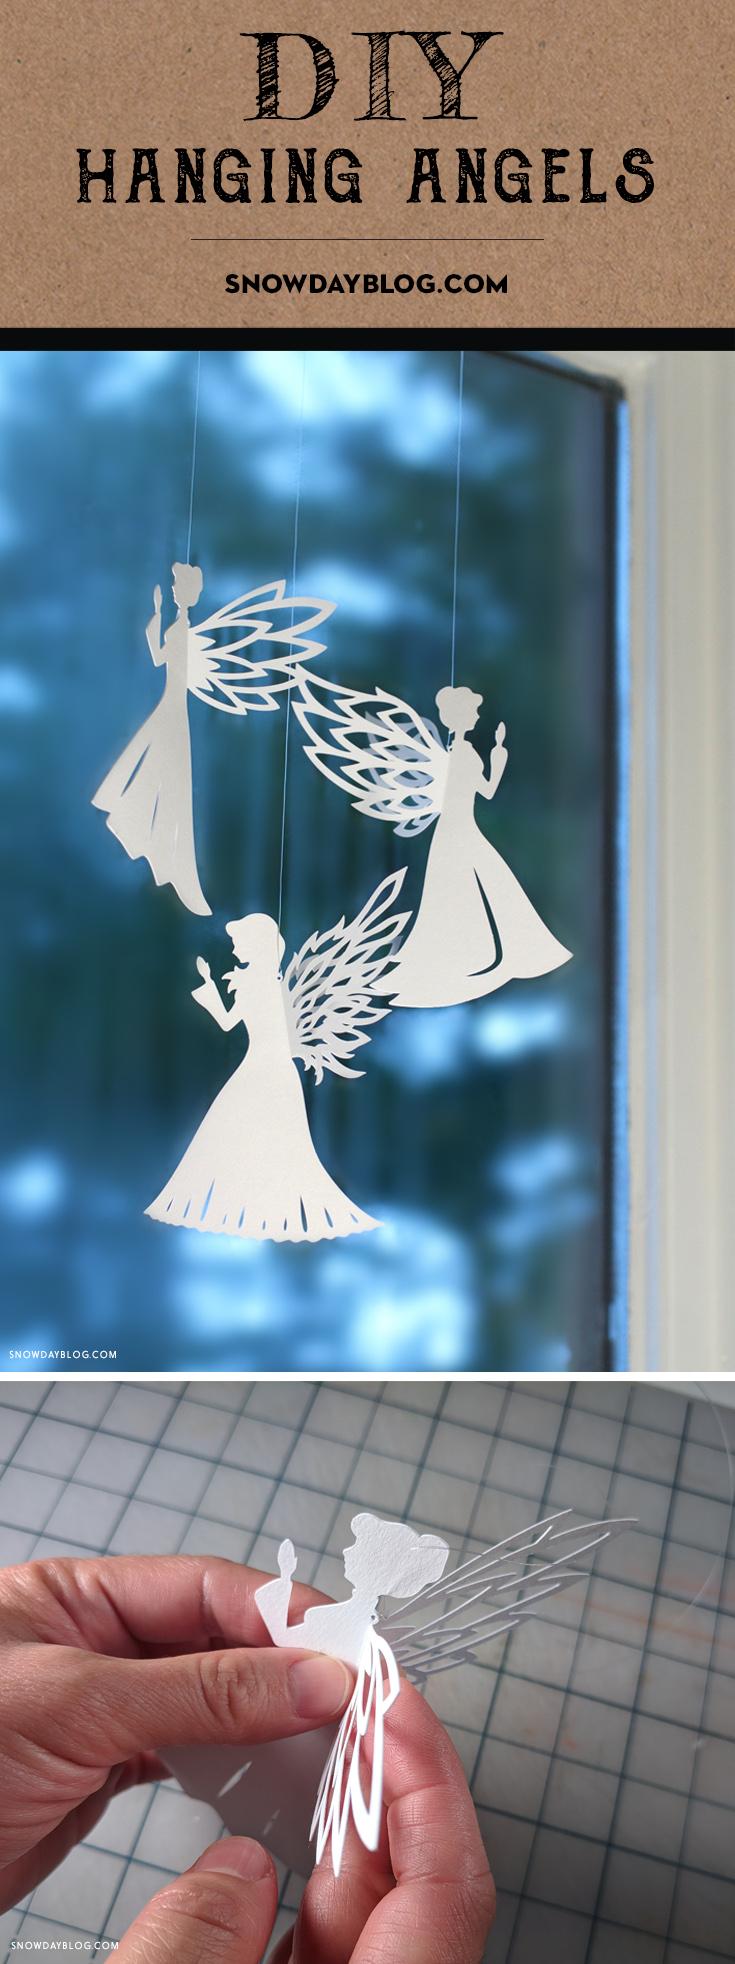 DIY Hanging Angels 1